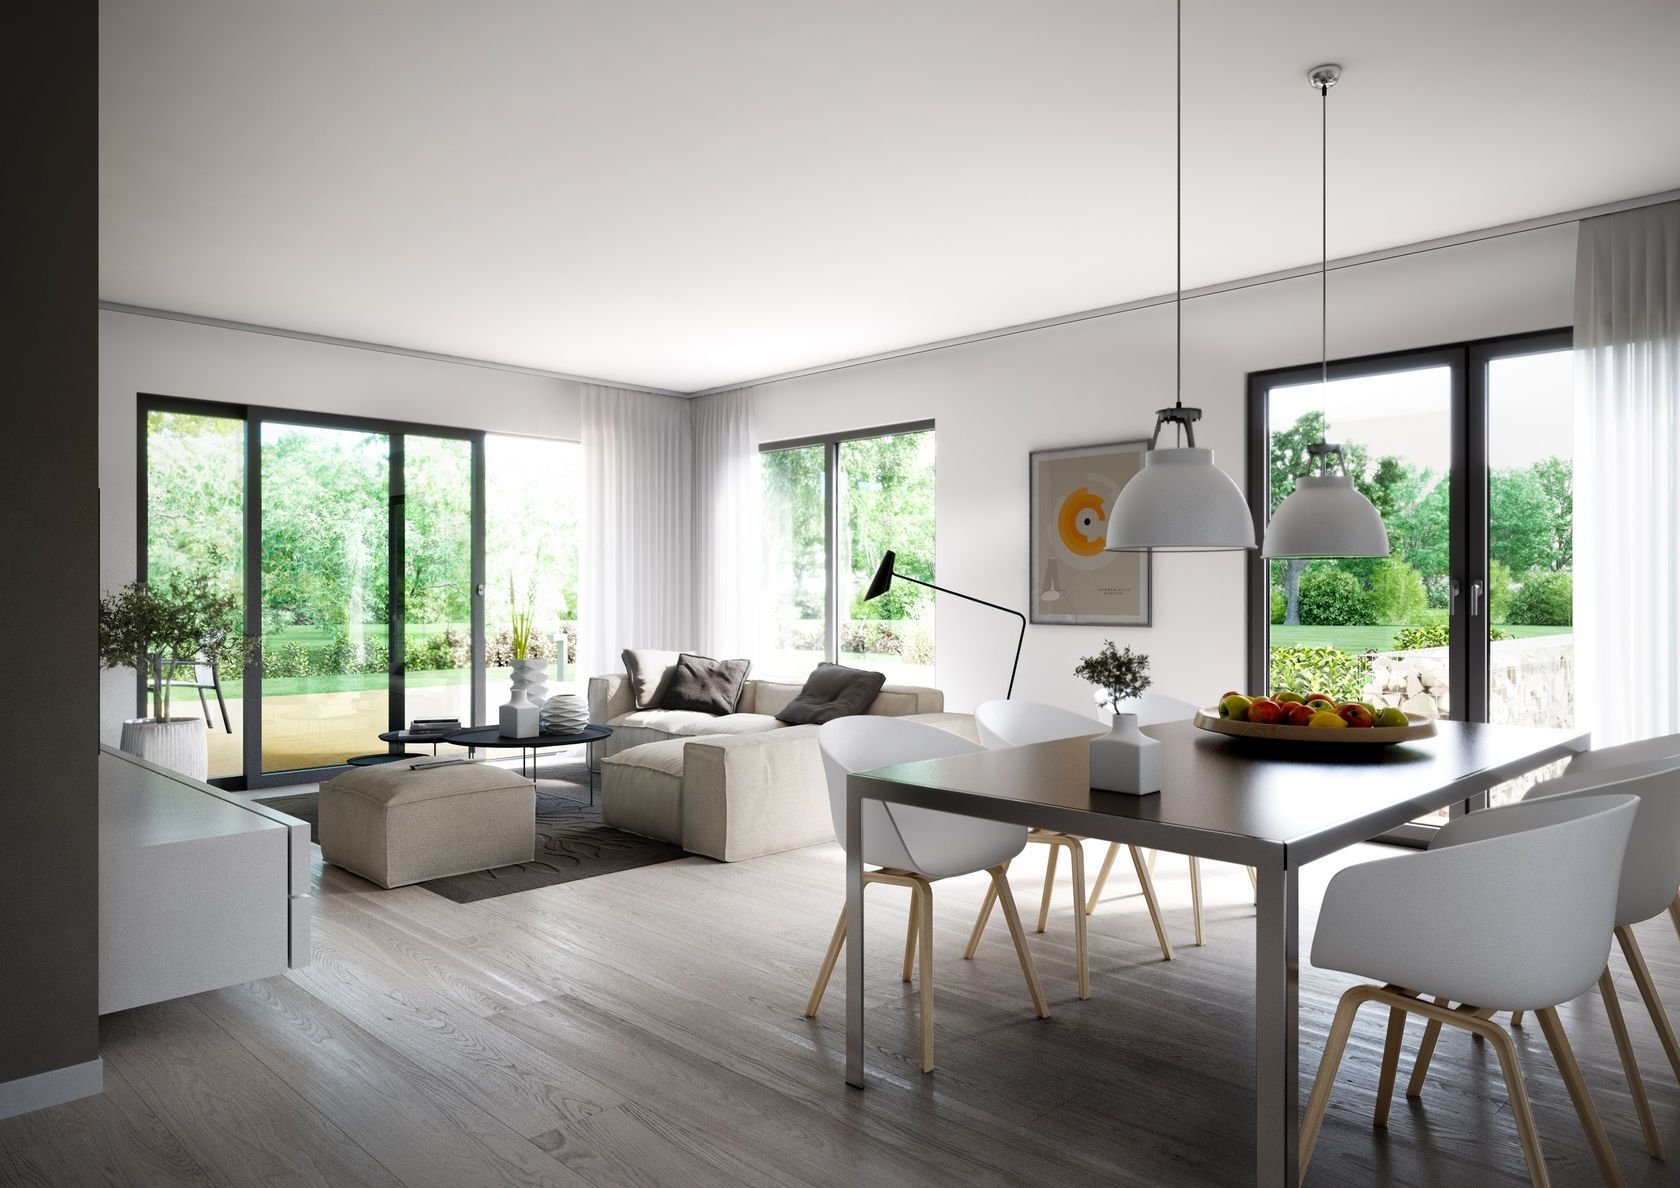 Kern-Haus Futura Bauhaus Wohnzimmer | Haus Inspo | Pinterest ...